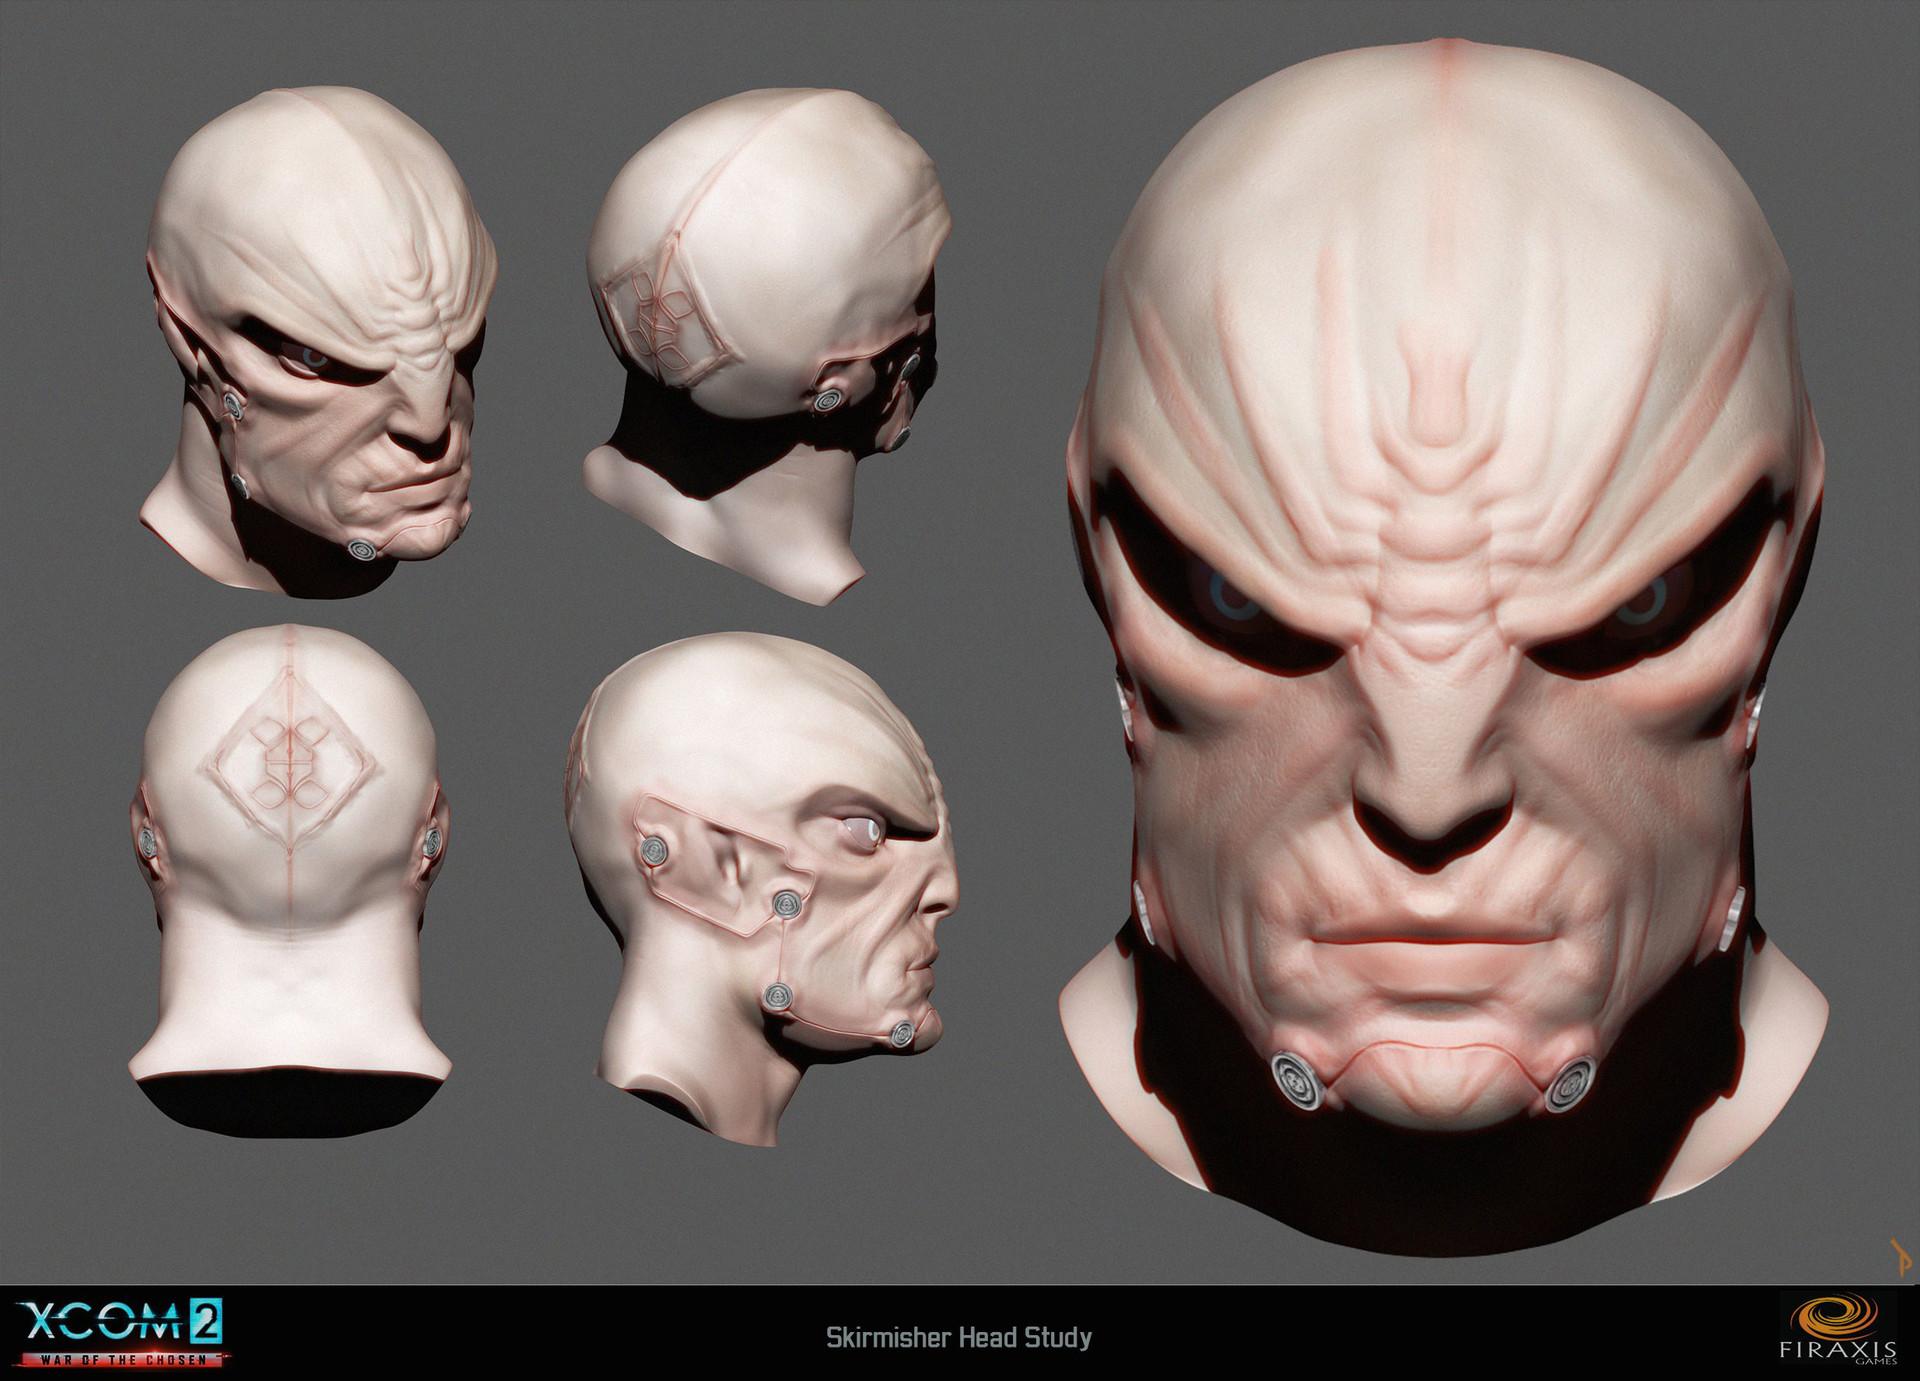 Skirmisher head detail study